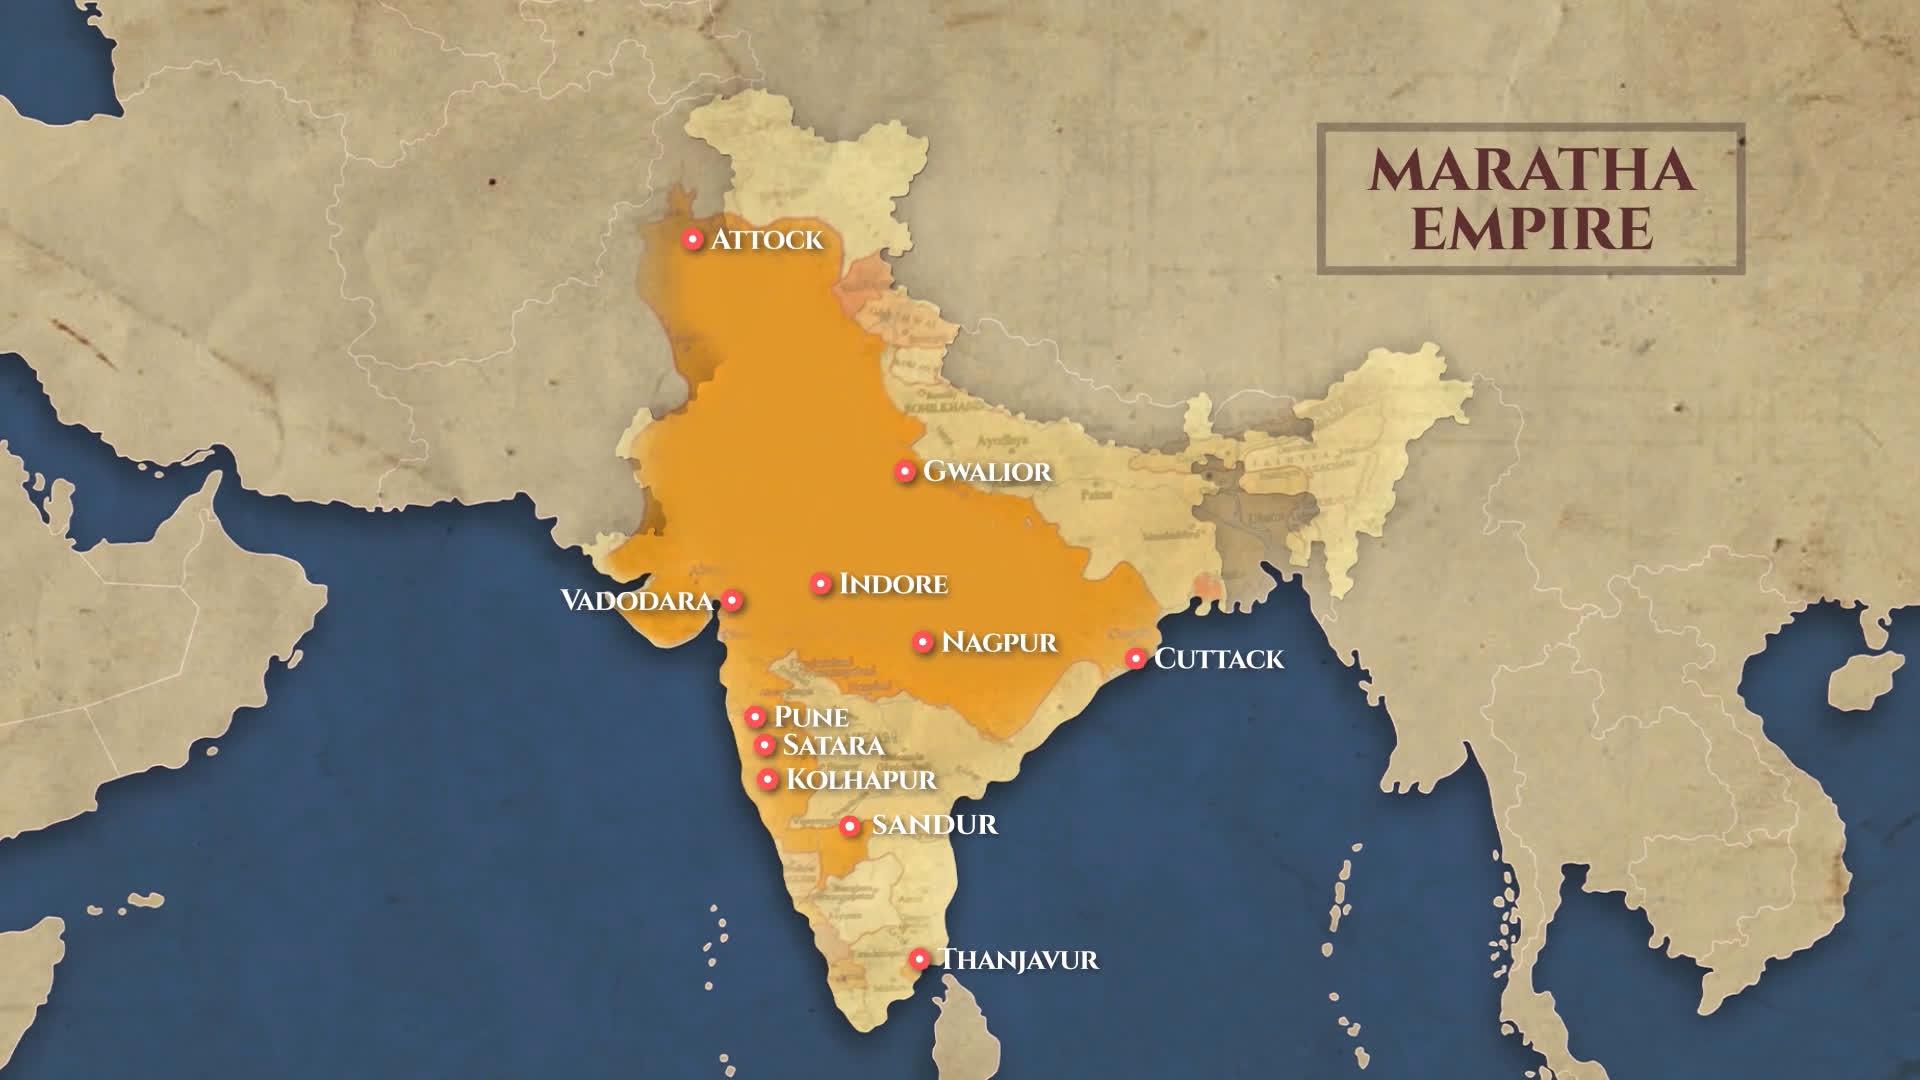 The extent of the Maratha Empire   LHI